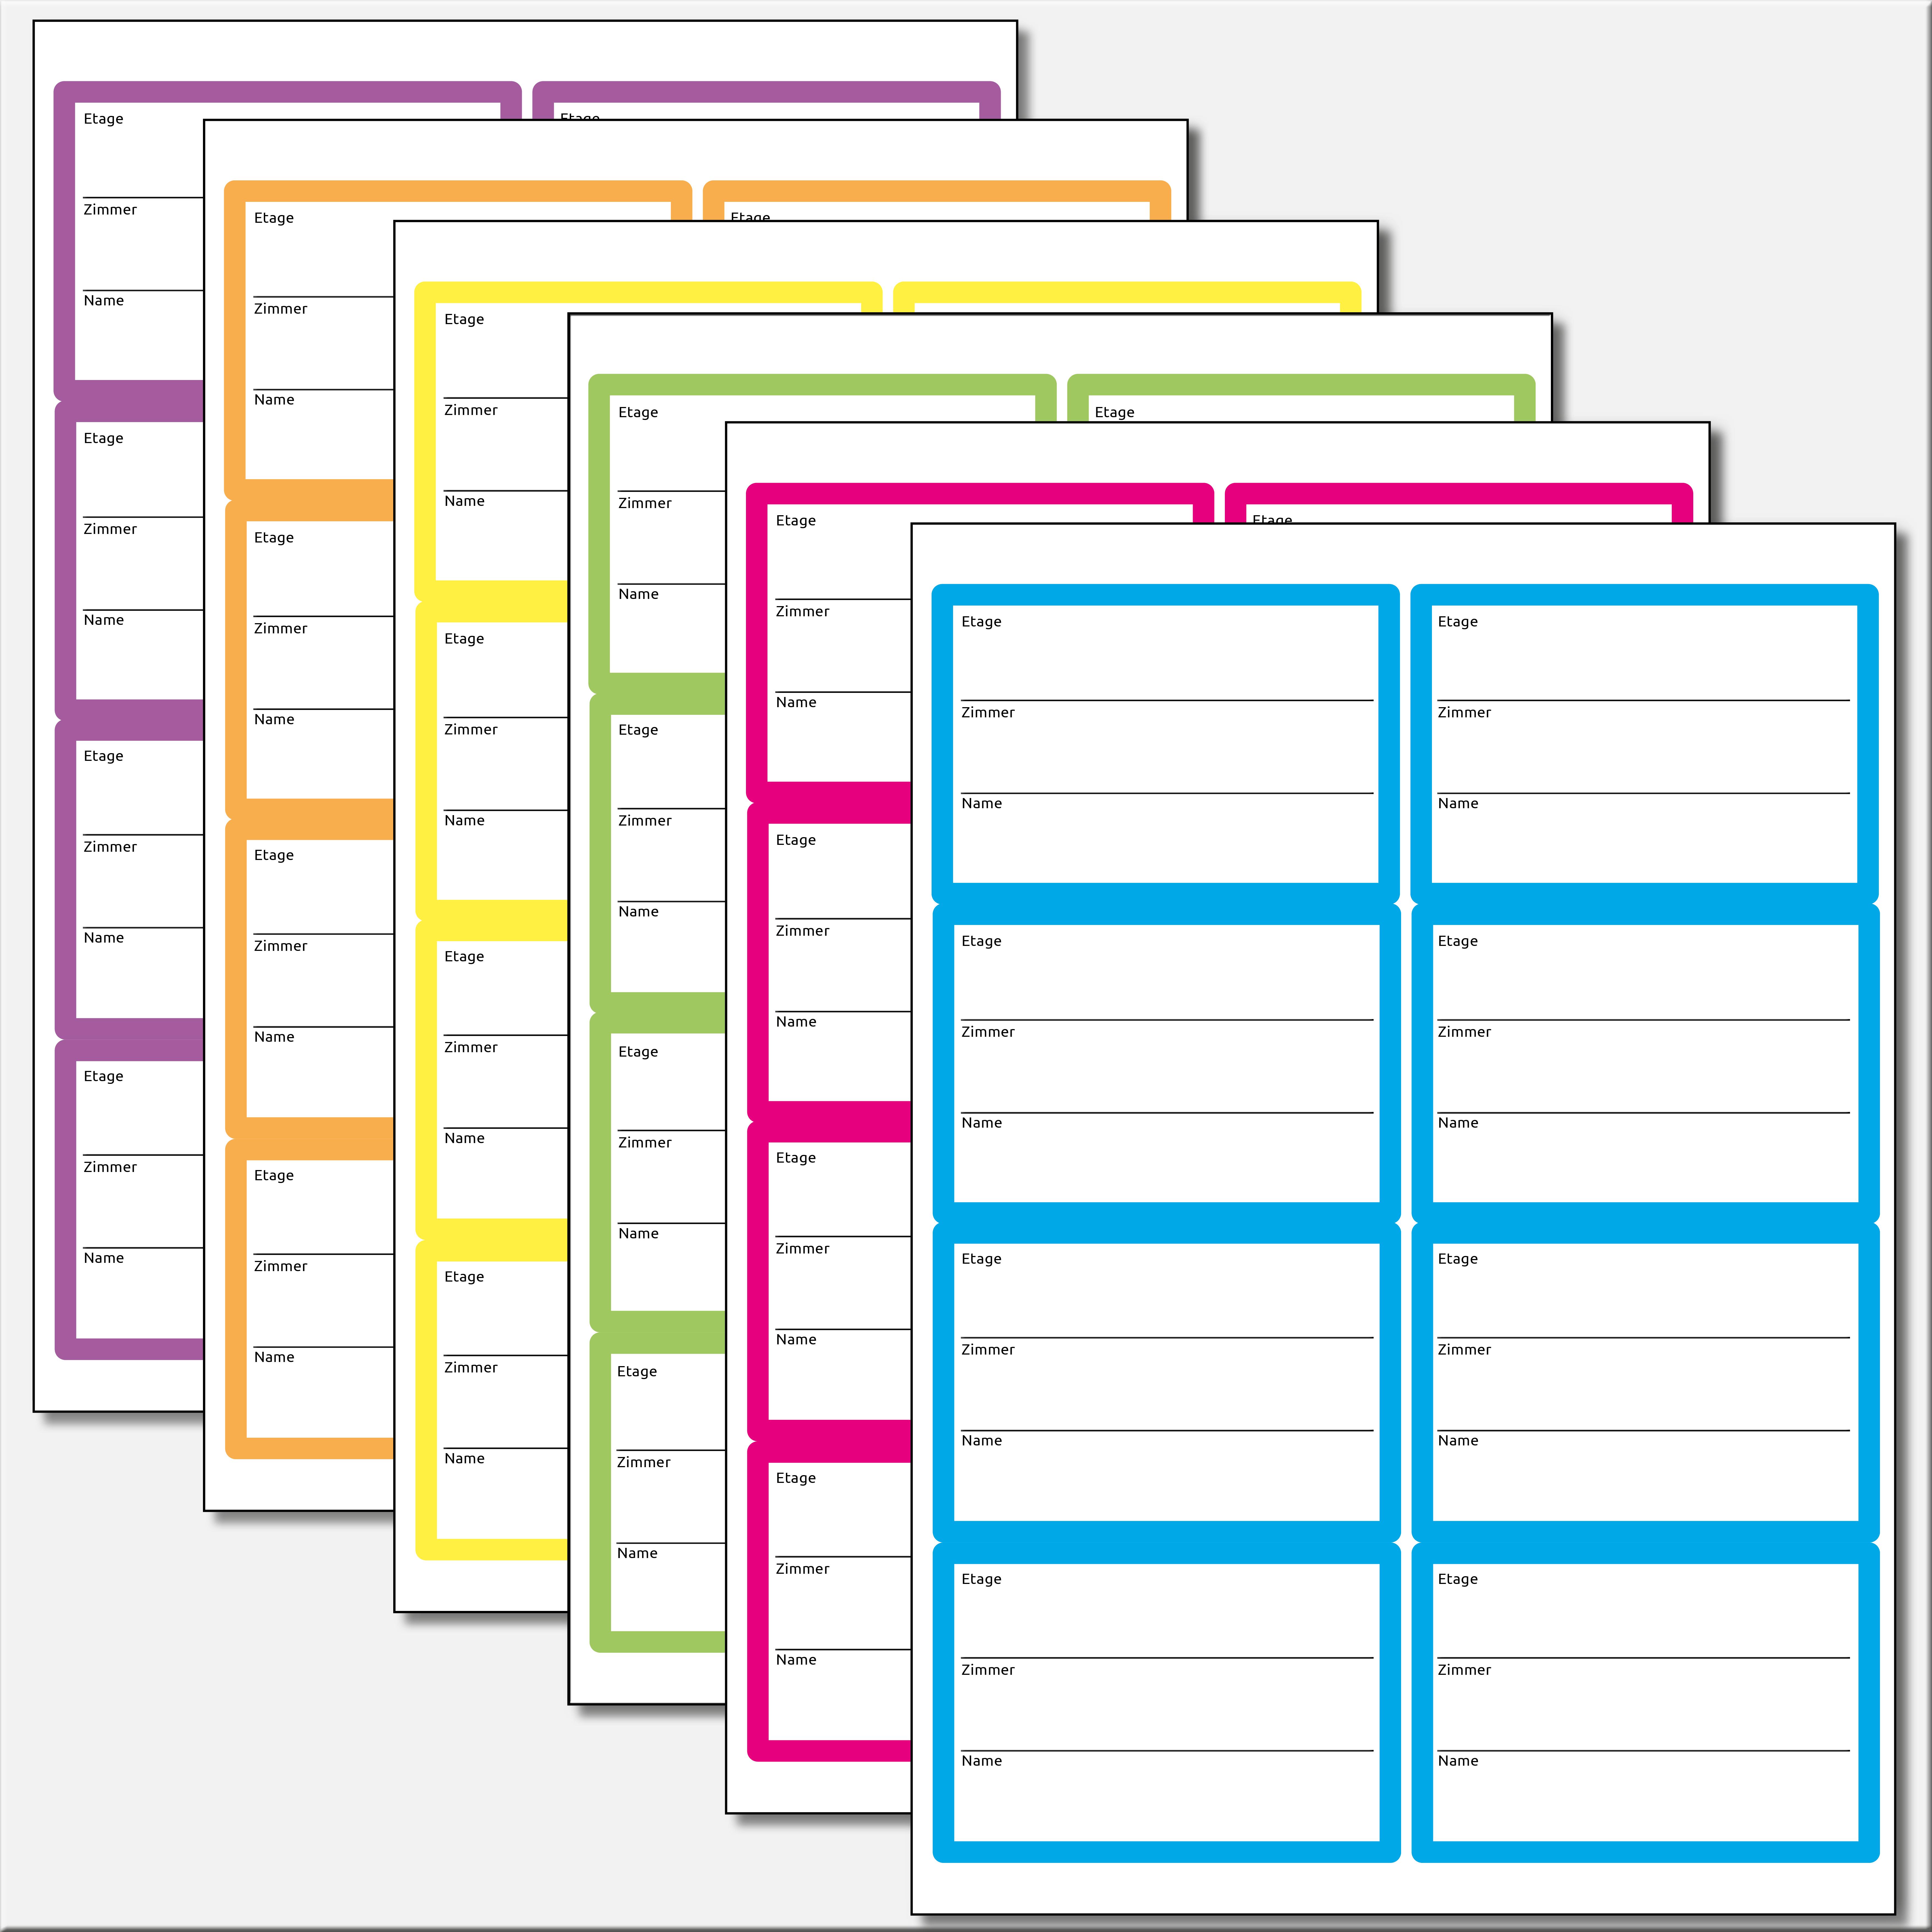 Rahmen8-Text-alle-printlogin